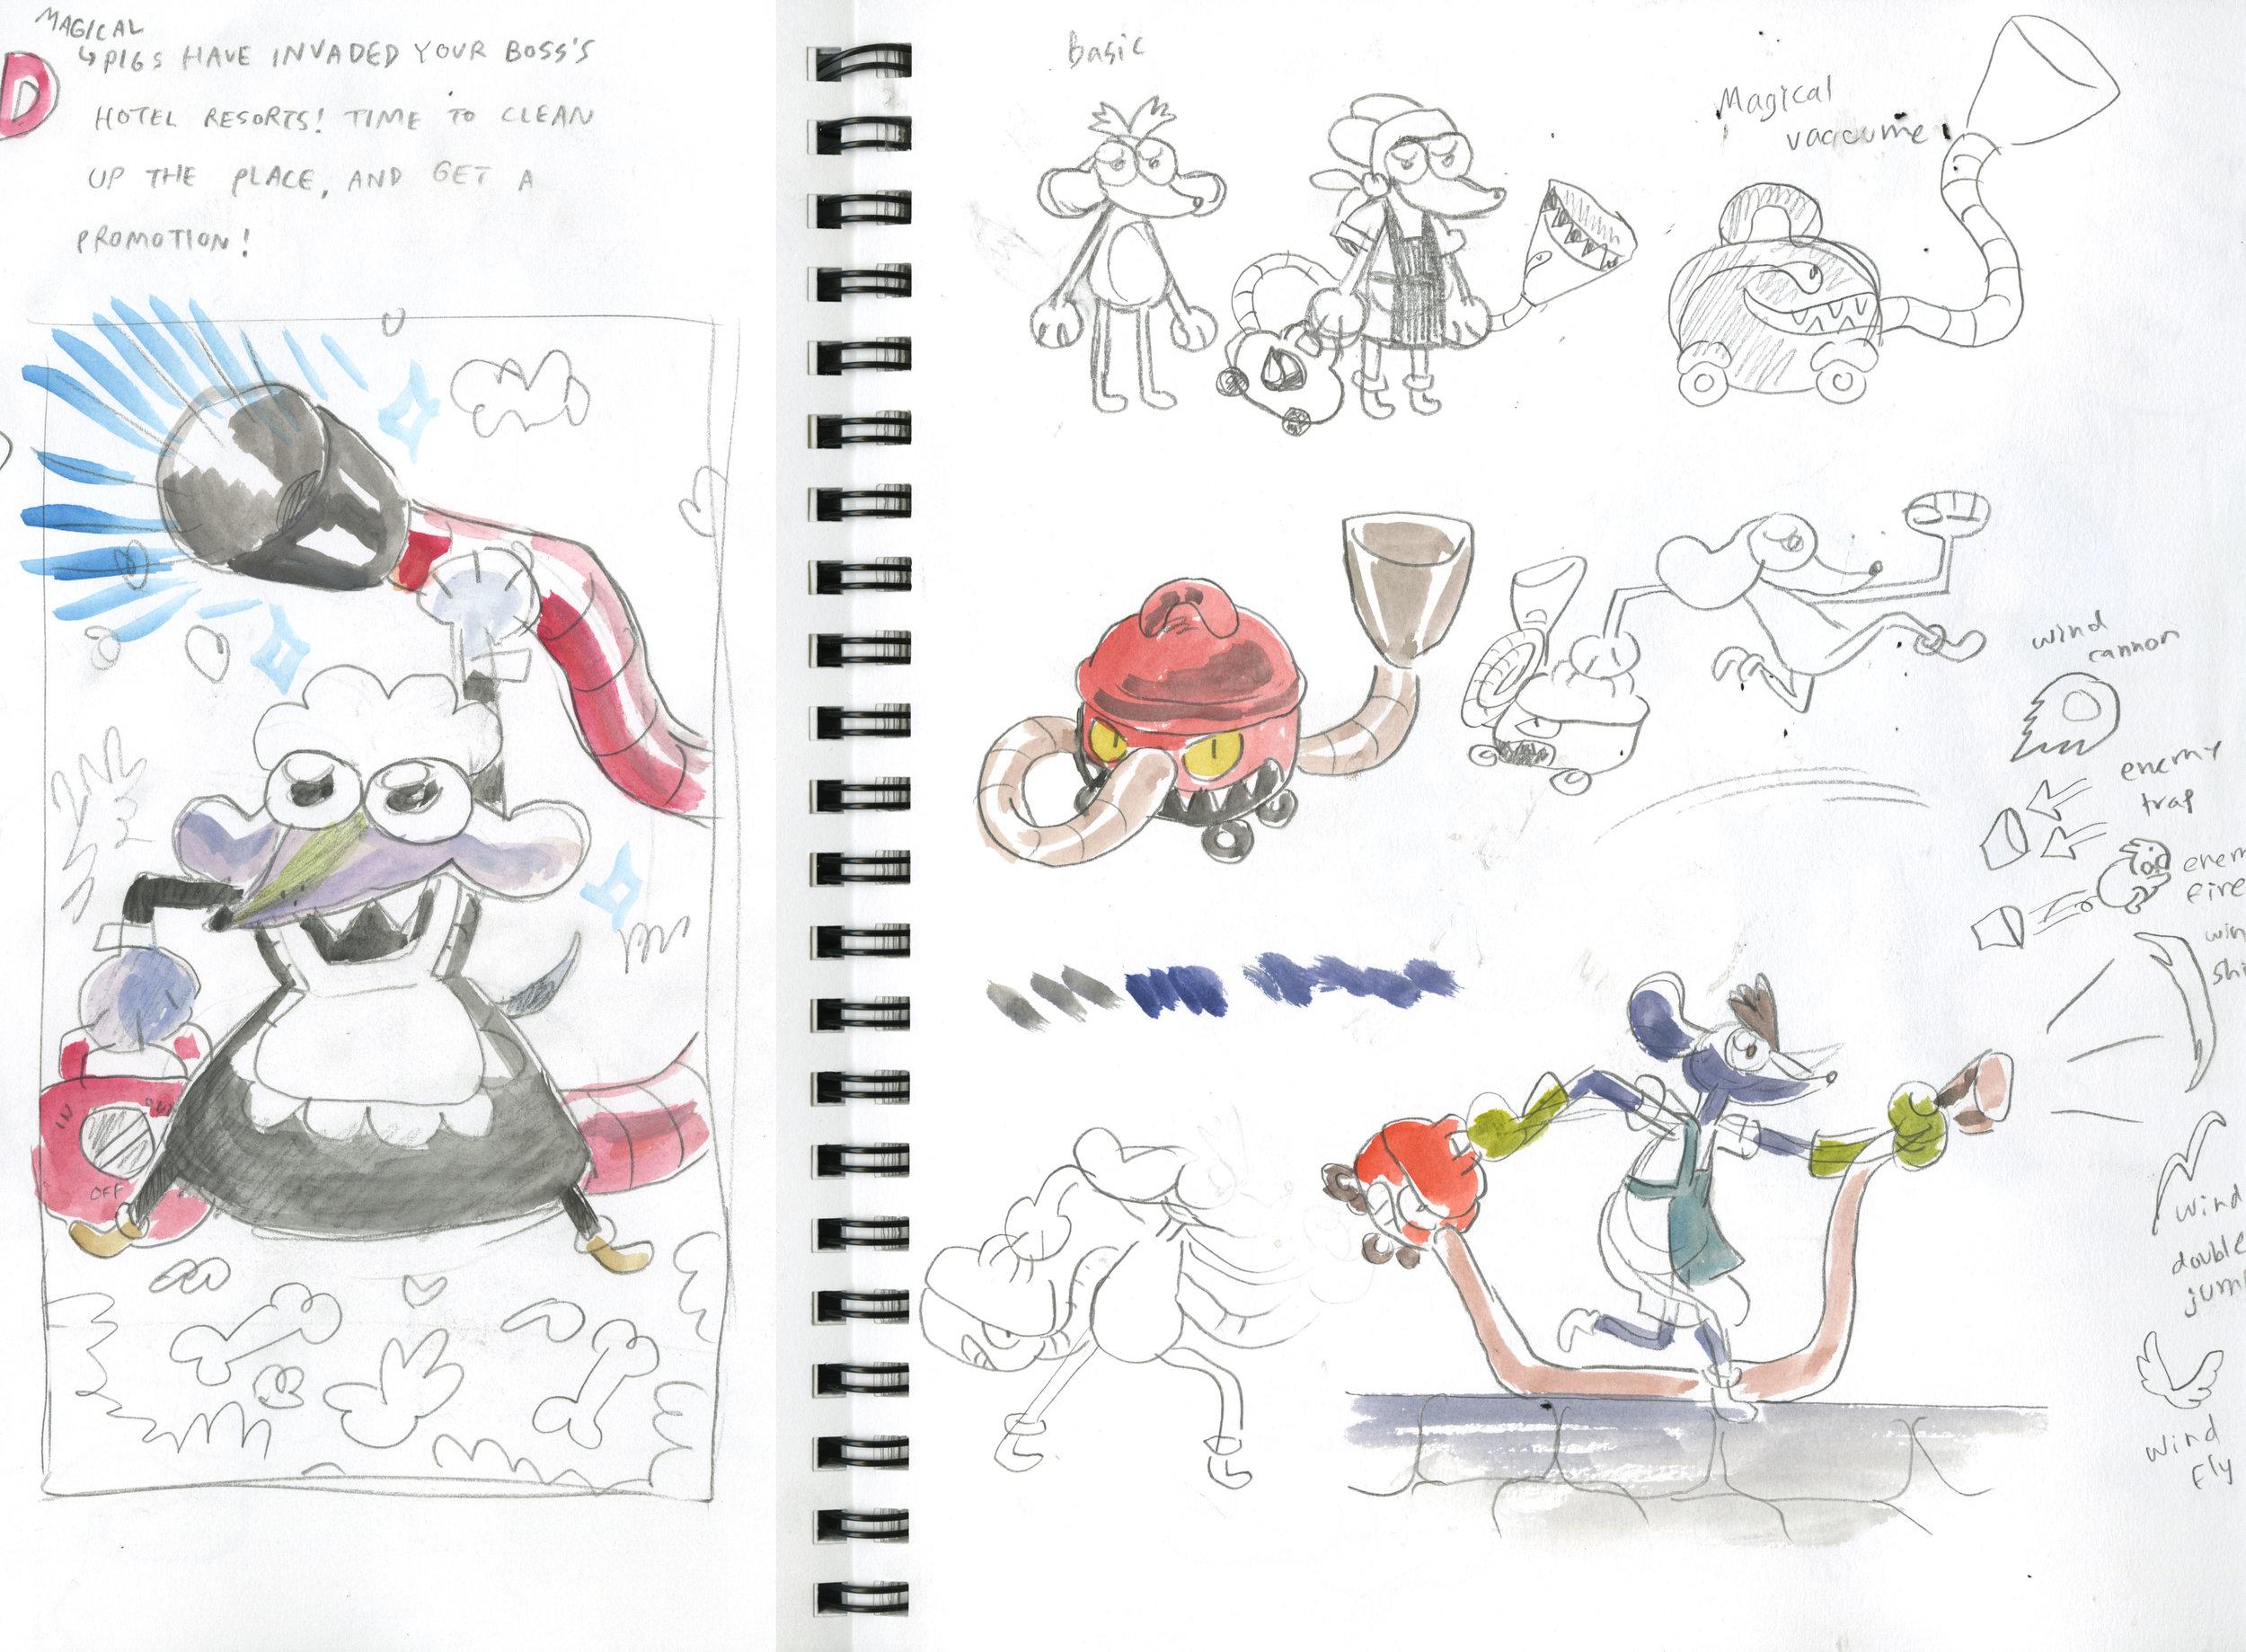 jess-pollard-concept-sketch-1.jpg